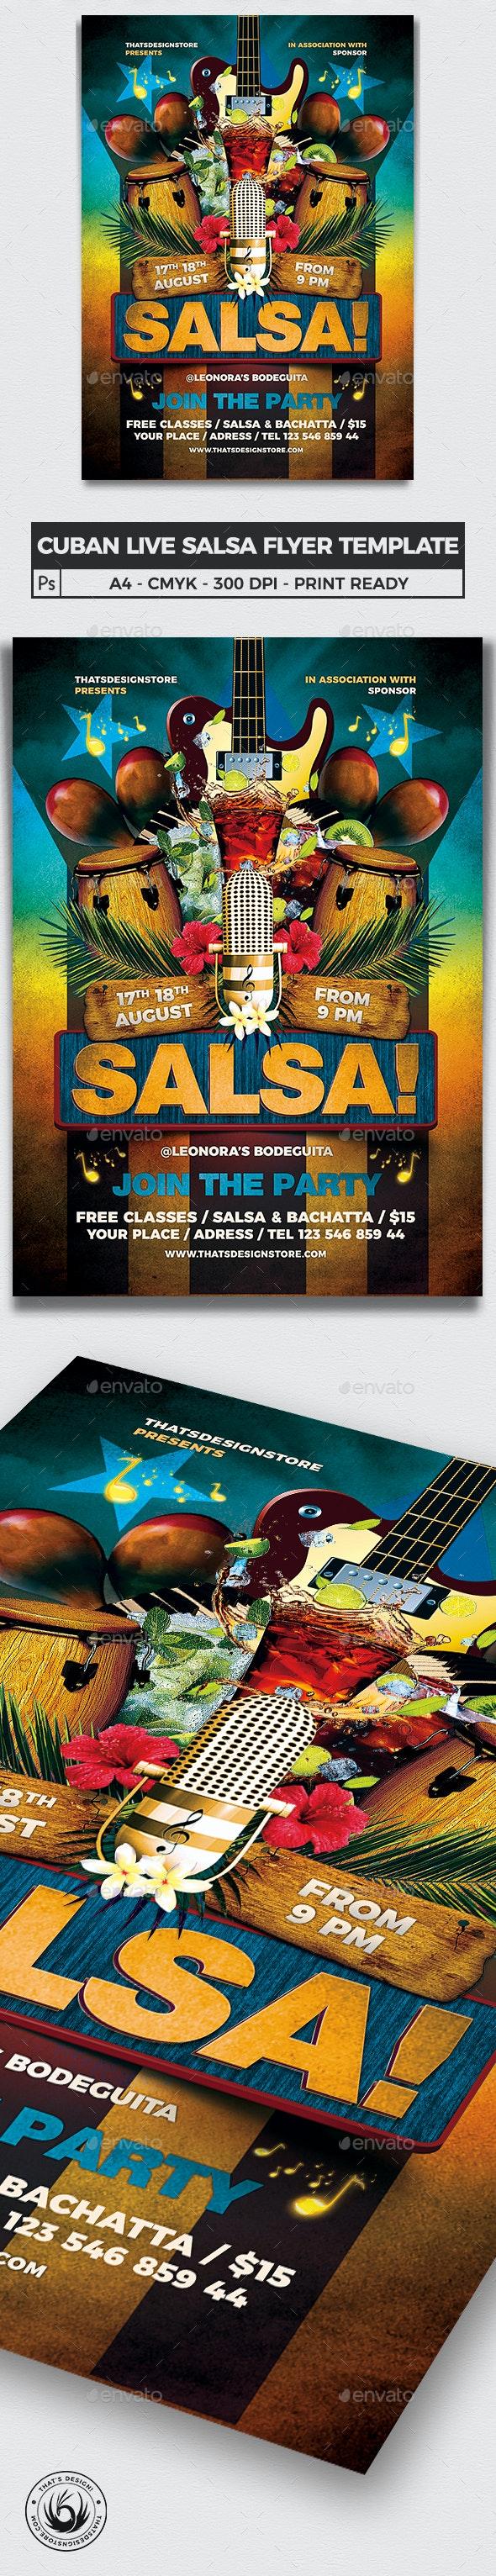 Cuban Live Salsa Flyer Template V1 - Concerts Events